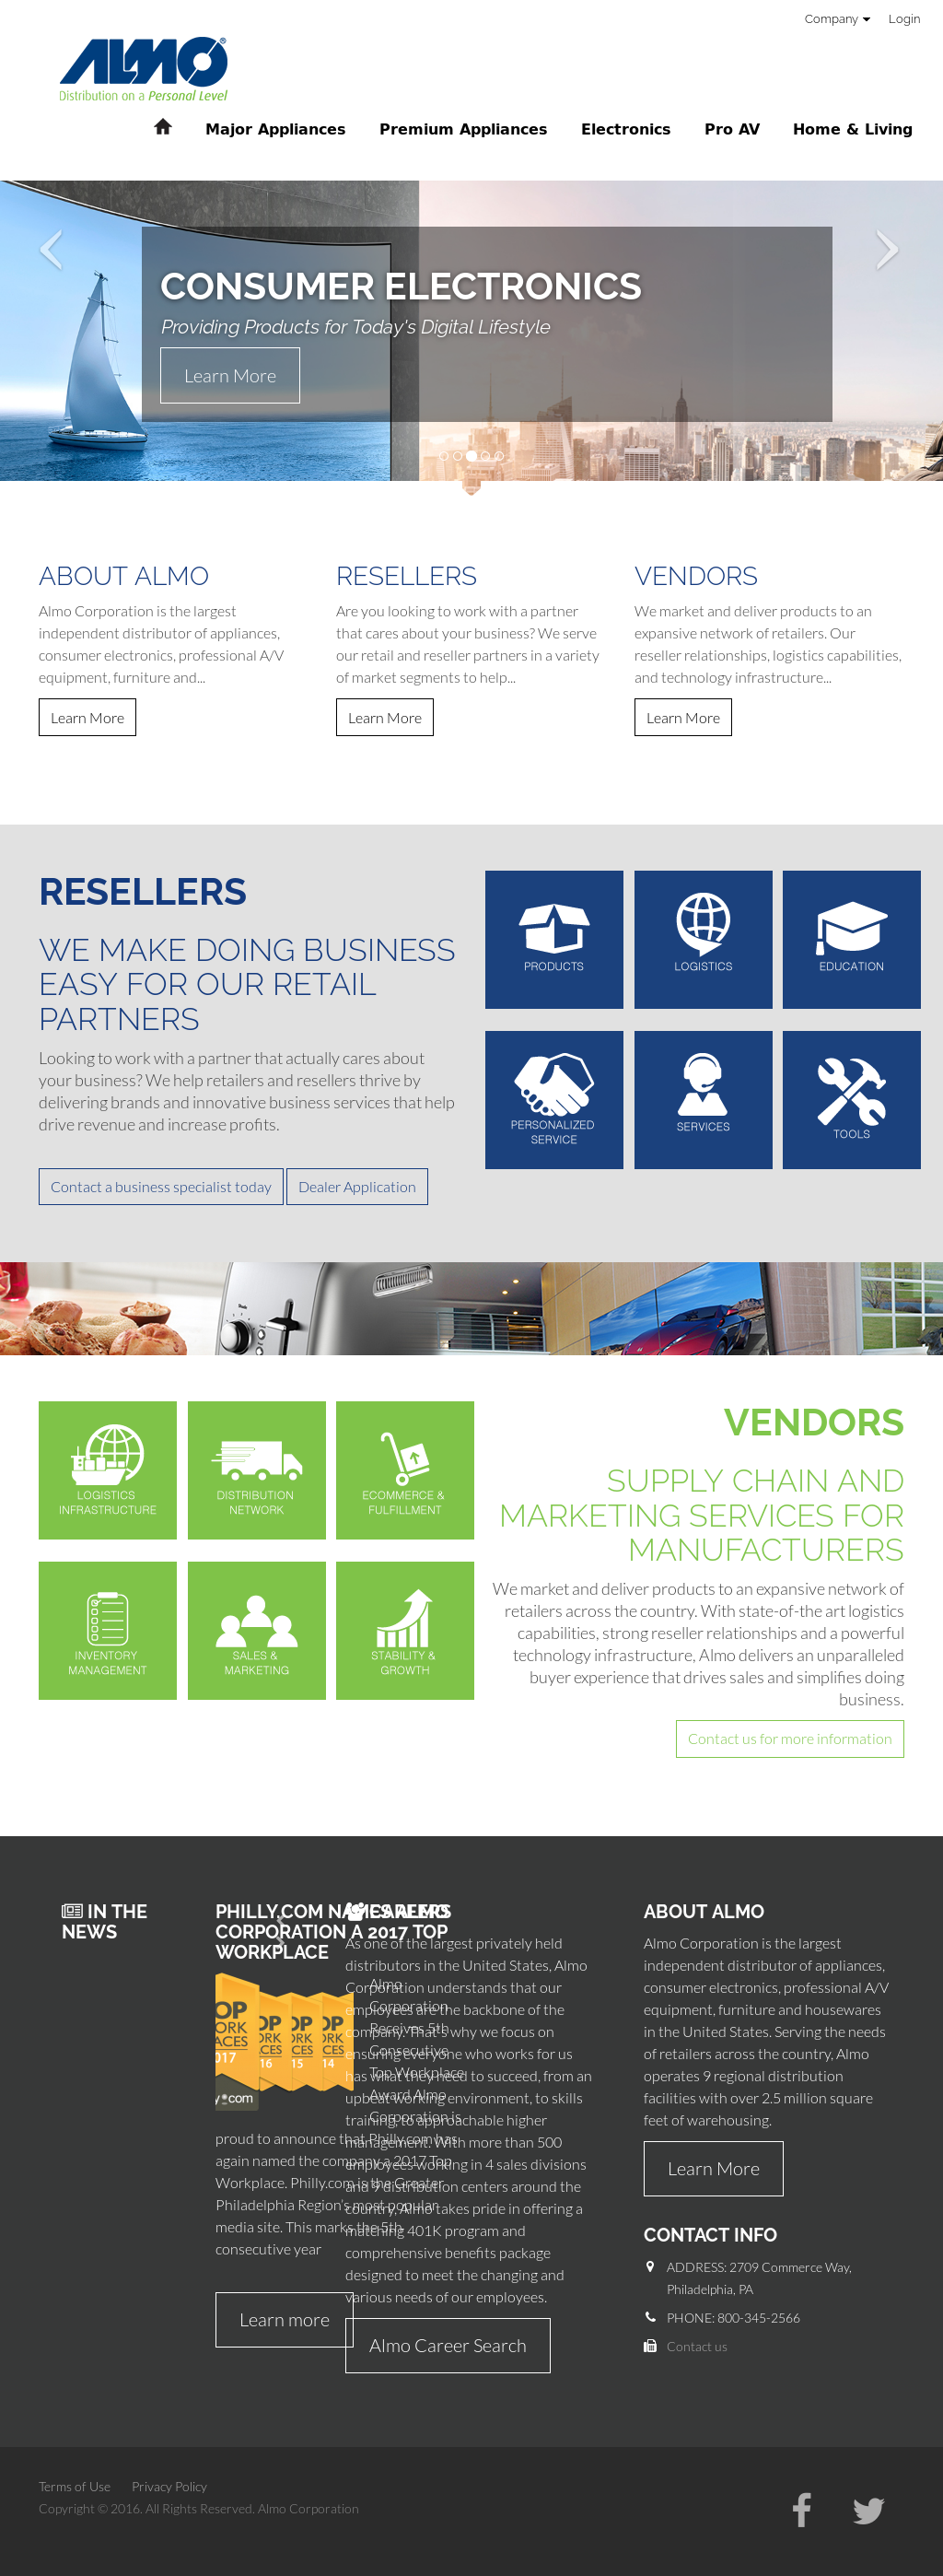 Almo Competitors, Revenue and Employees - Owler Company Profile